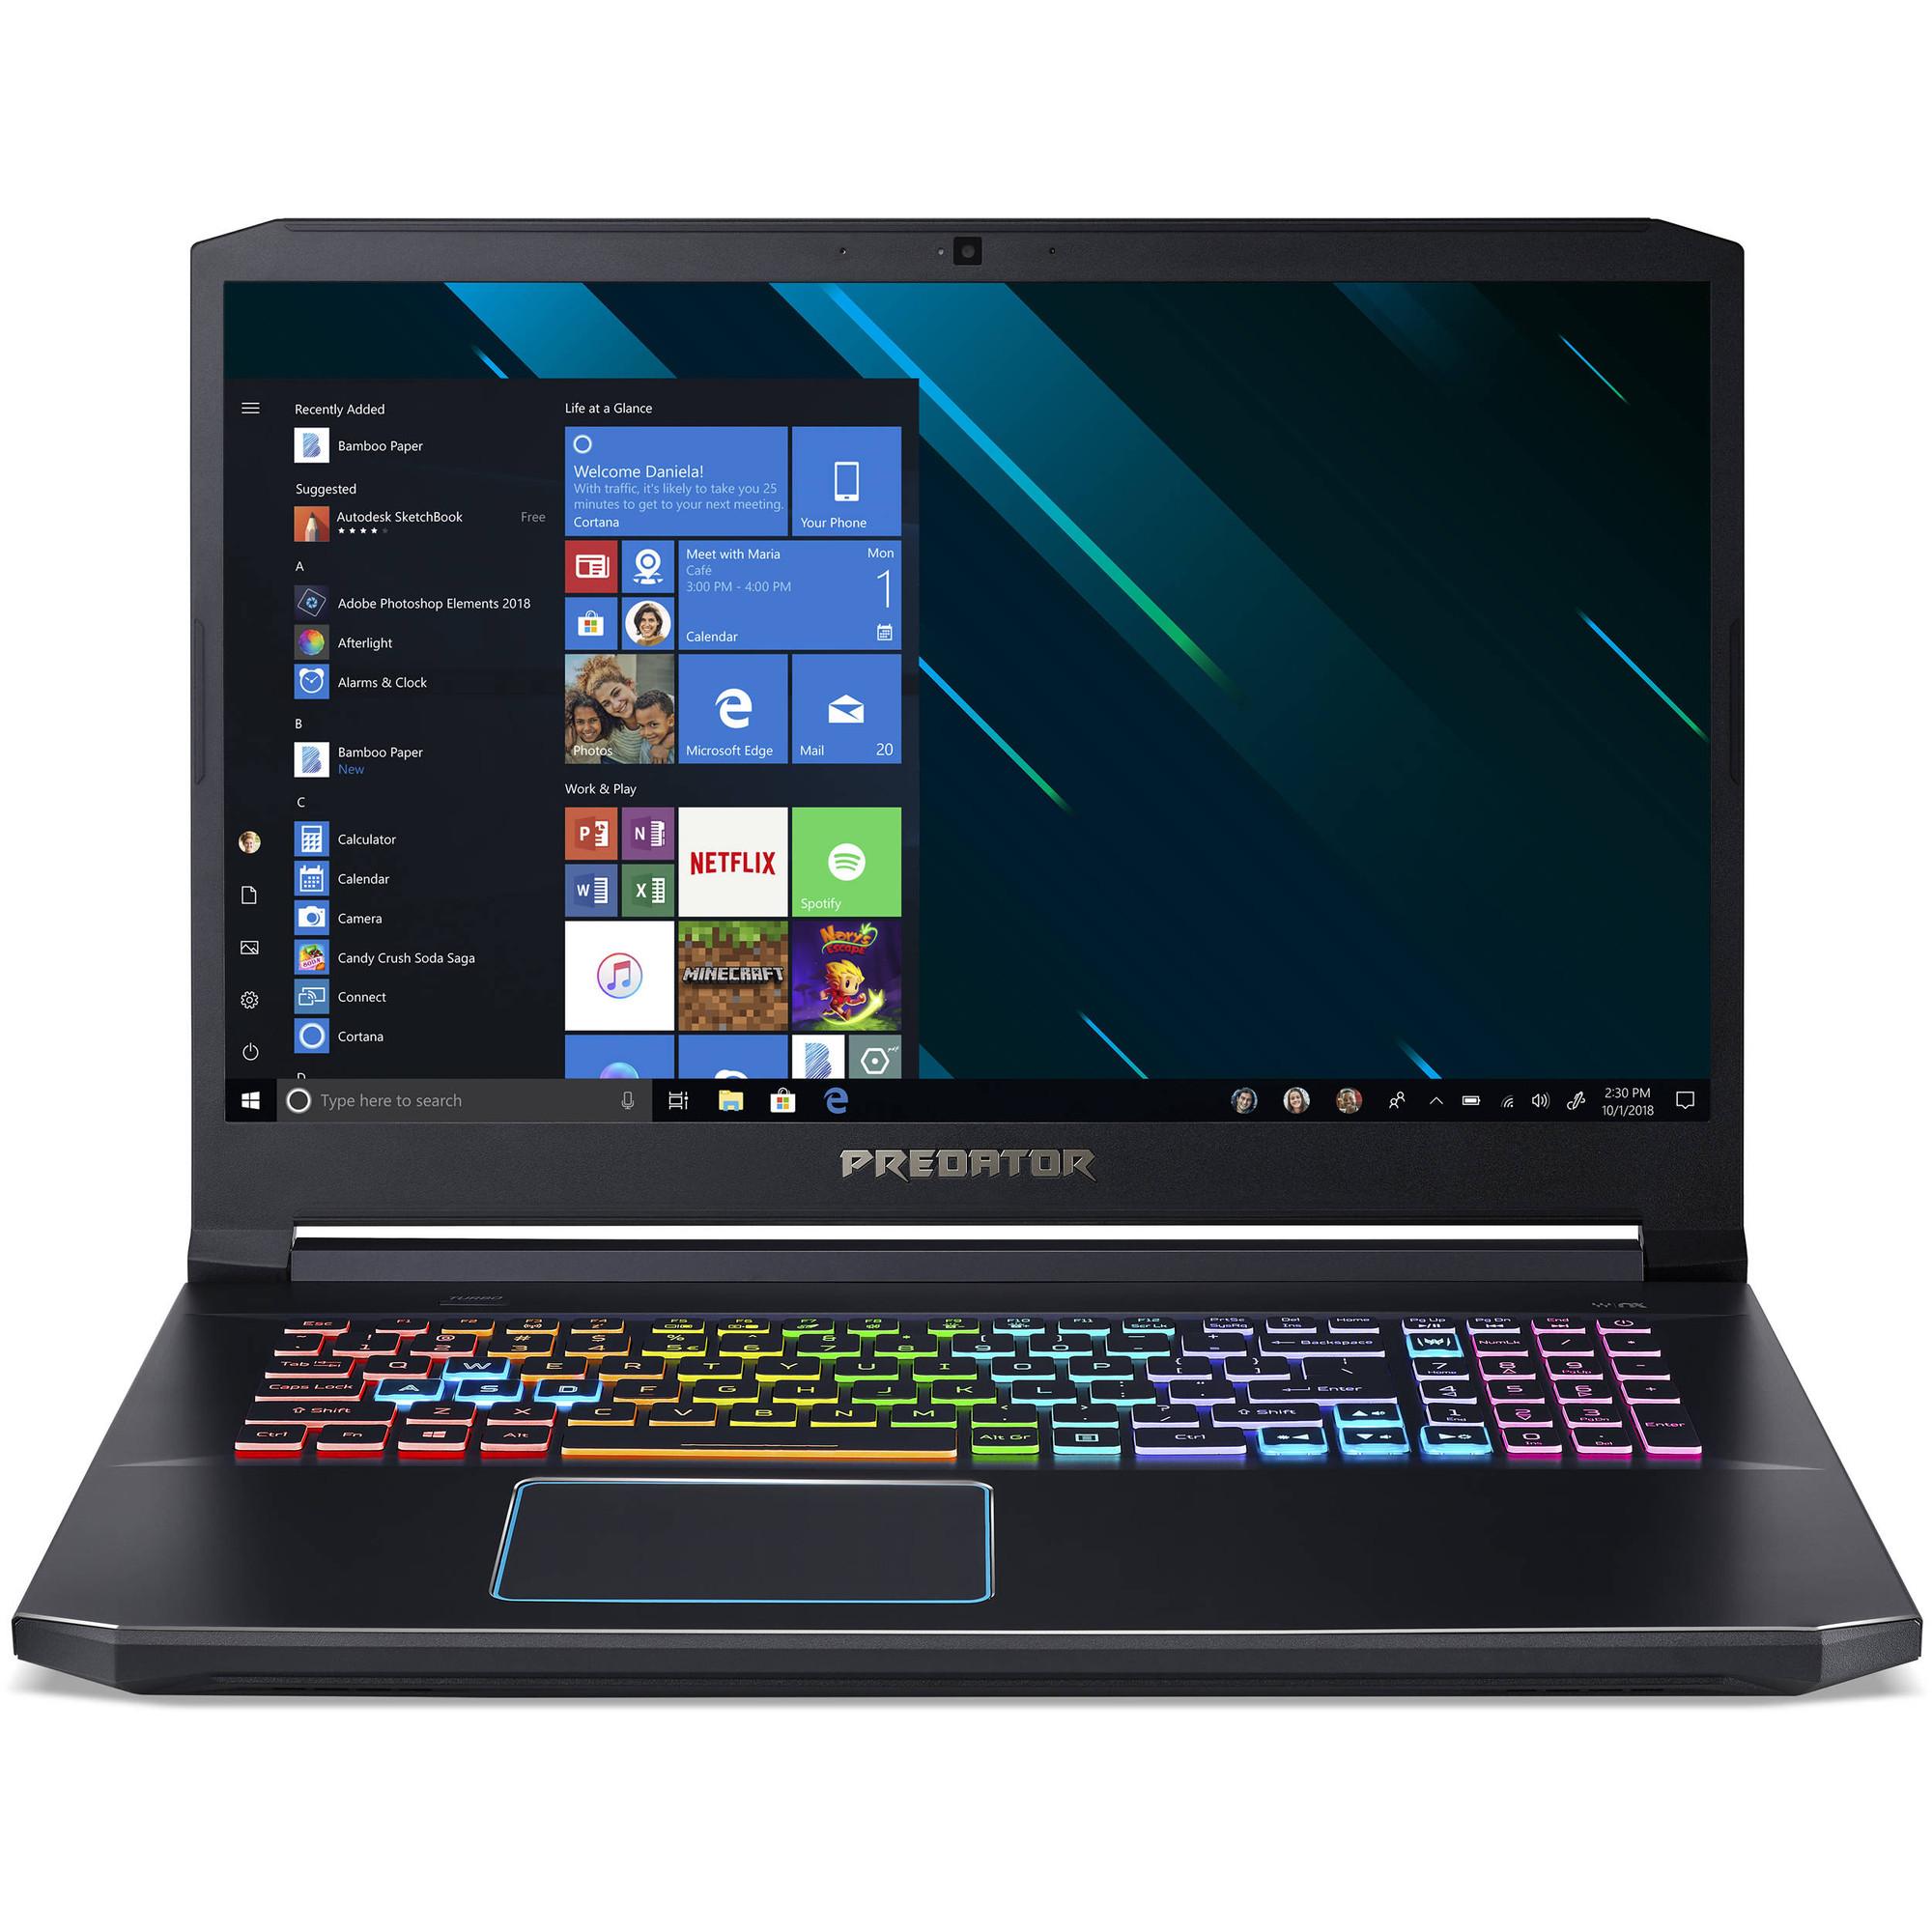 Acer Predator Helios 300 17 3 Laptop Intel Core I7 9750h 2 60ghz 16gb Ram 512gb Ssd Windows 10 Home Ph317 53 7777